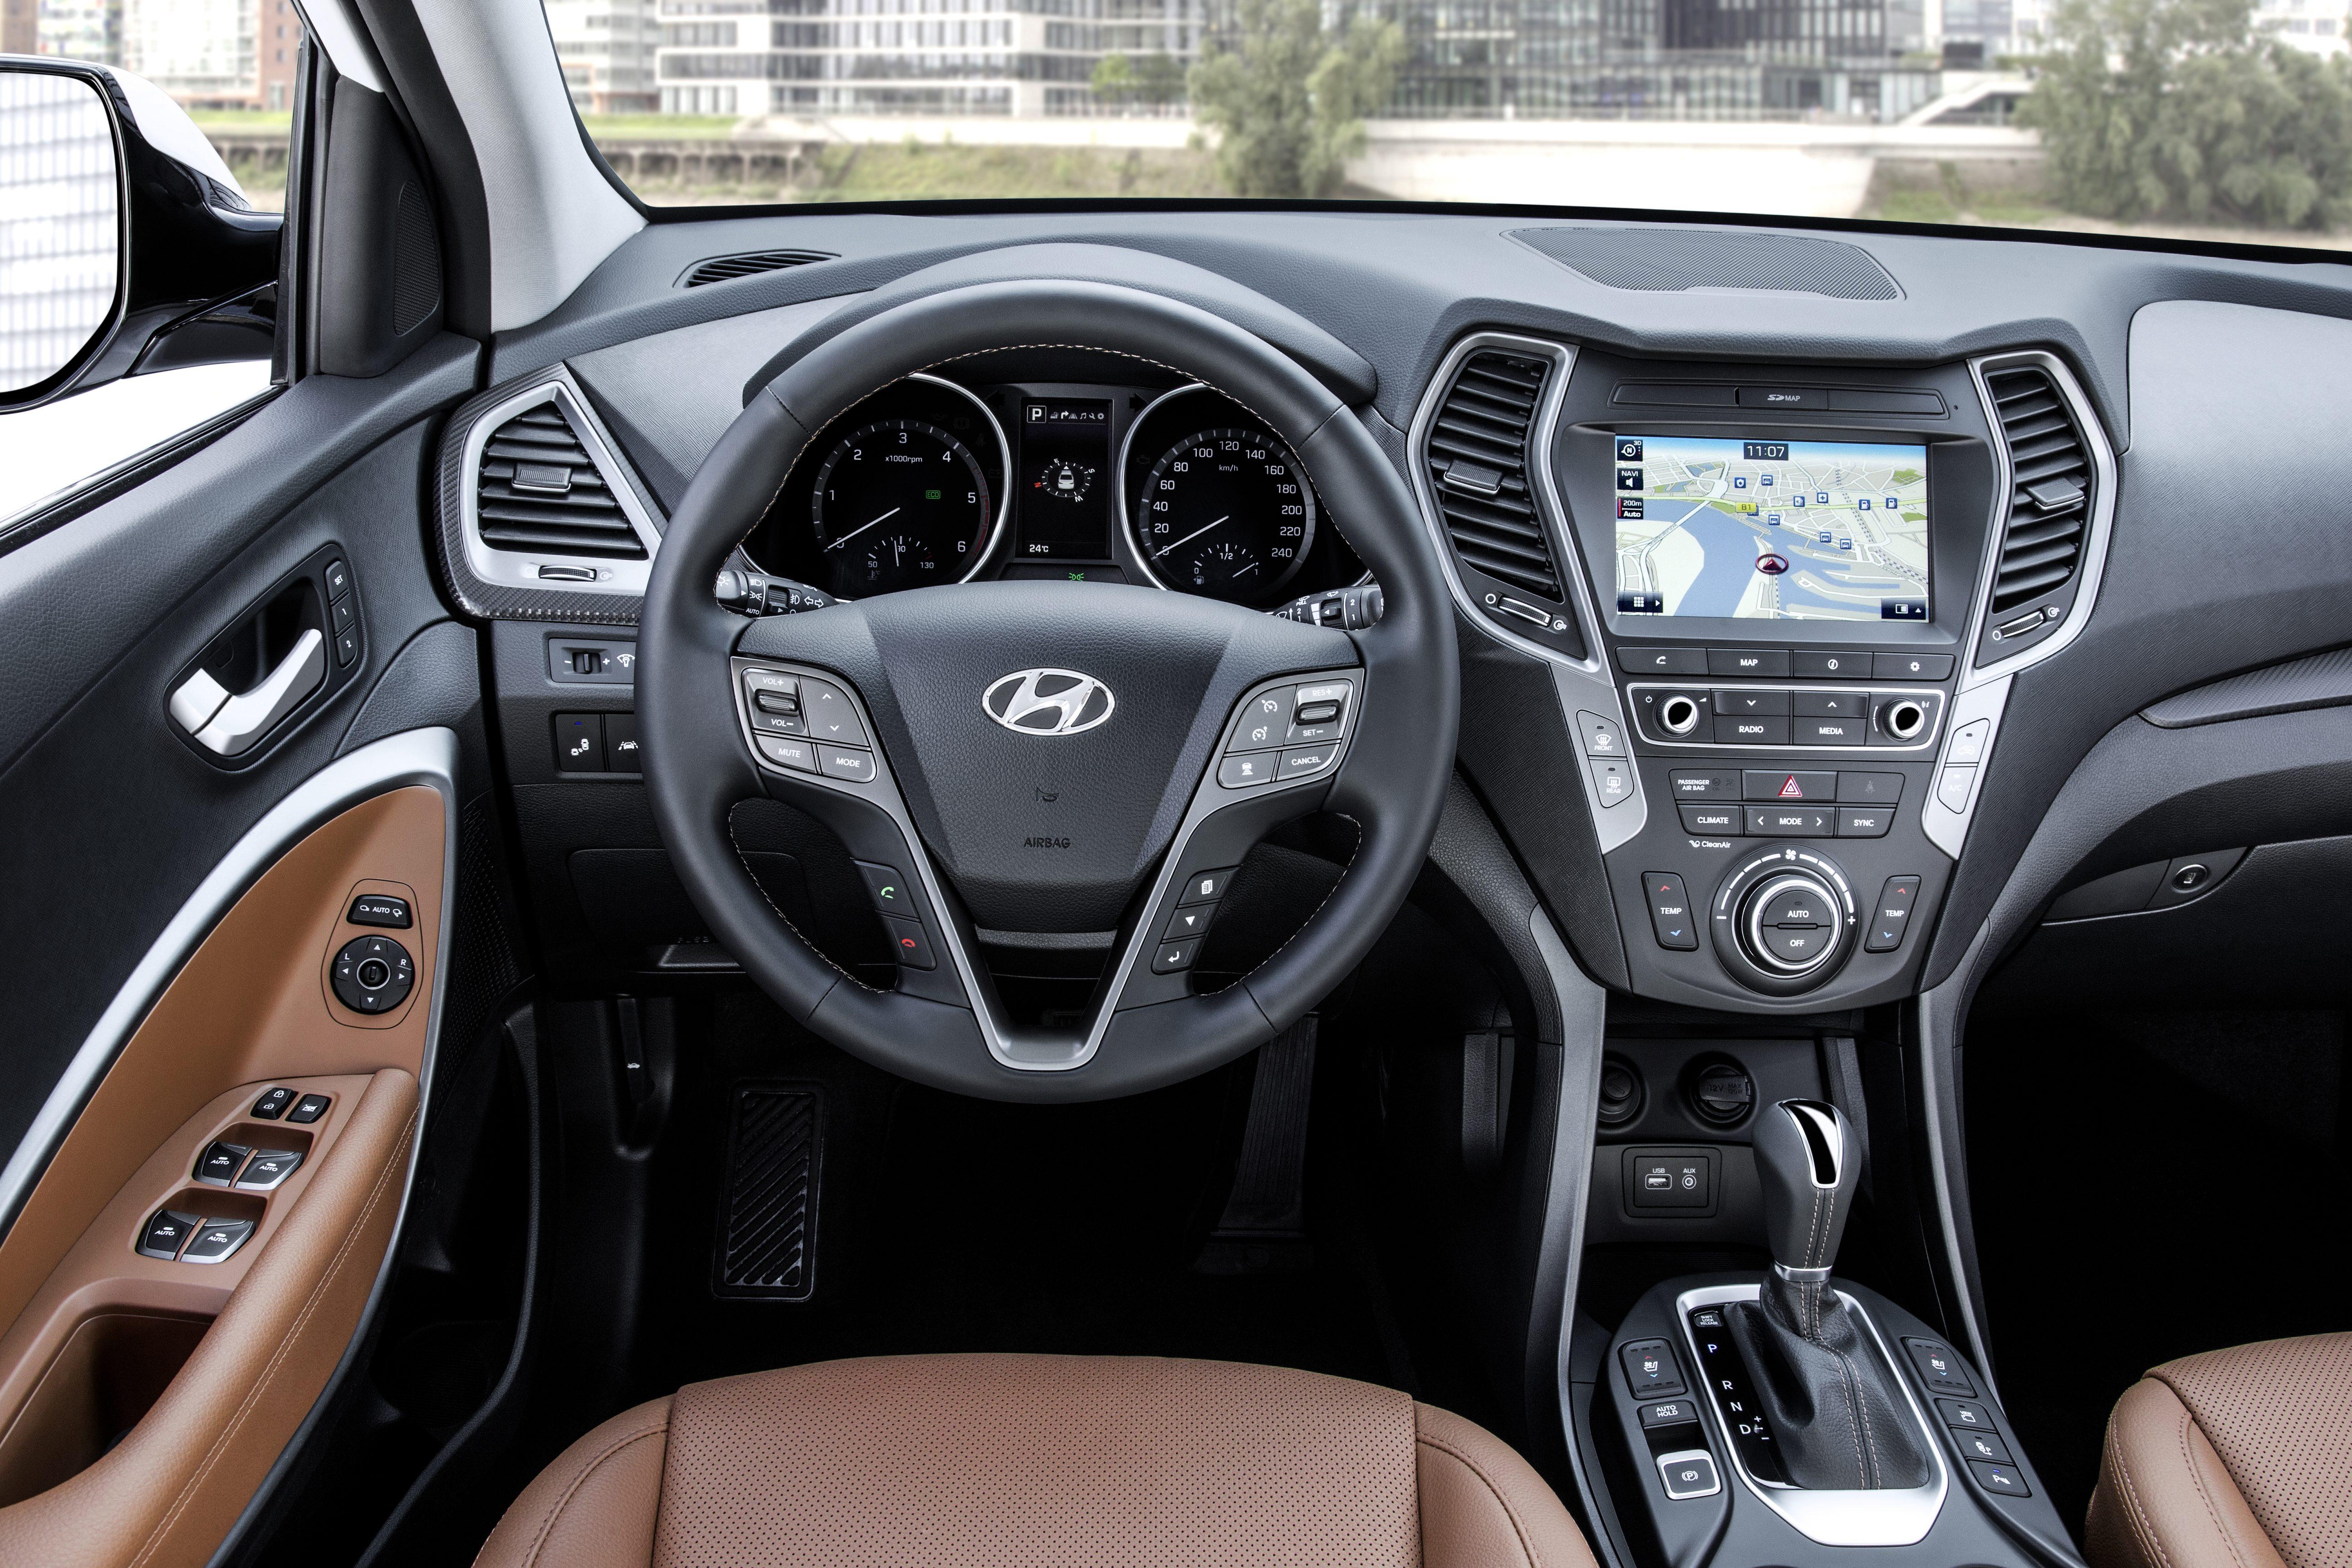 Hyundai santa fe suv harman harman original resolution biocorpaavc Images